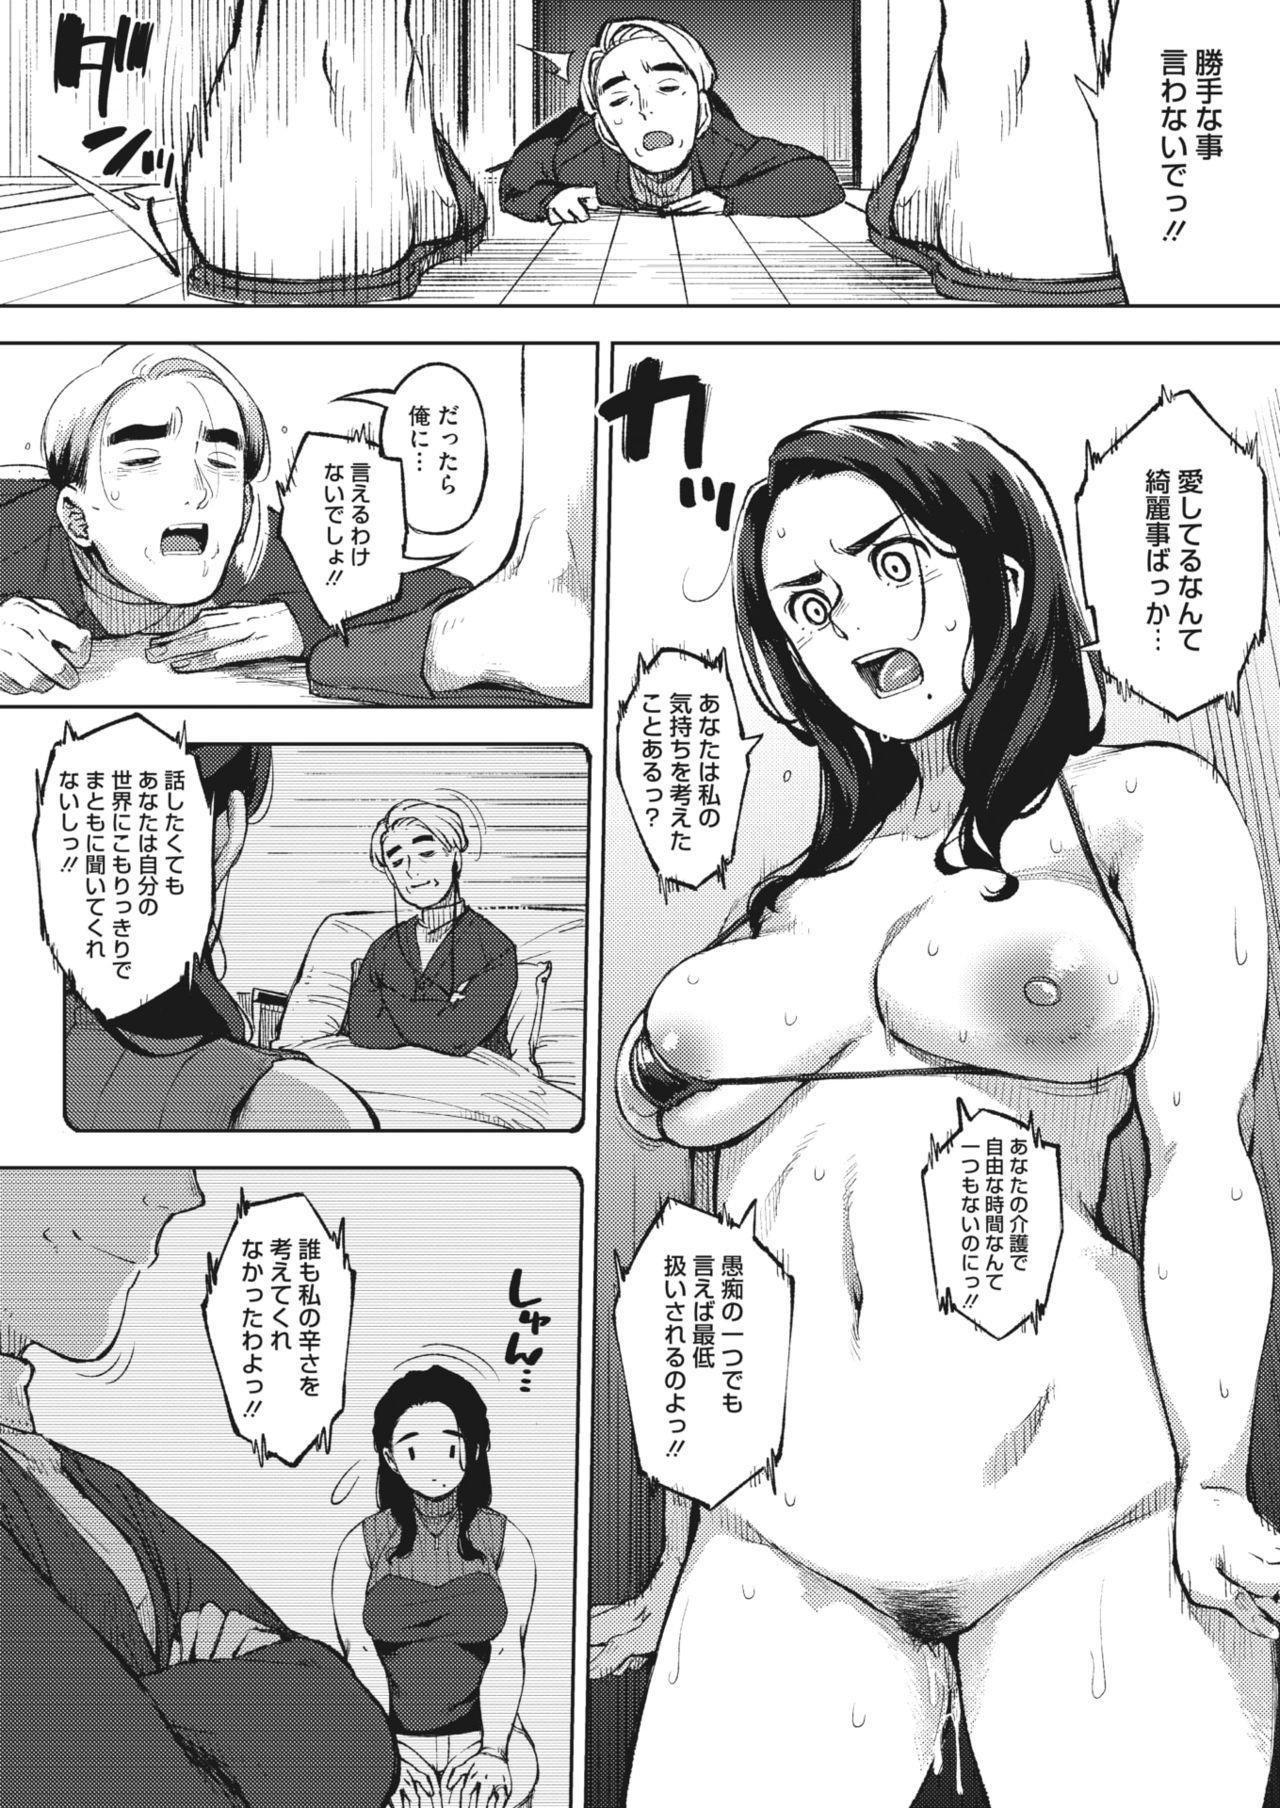 COMIC HOTMiLK Koime Vol. 22 38